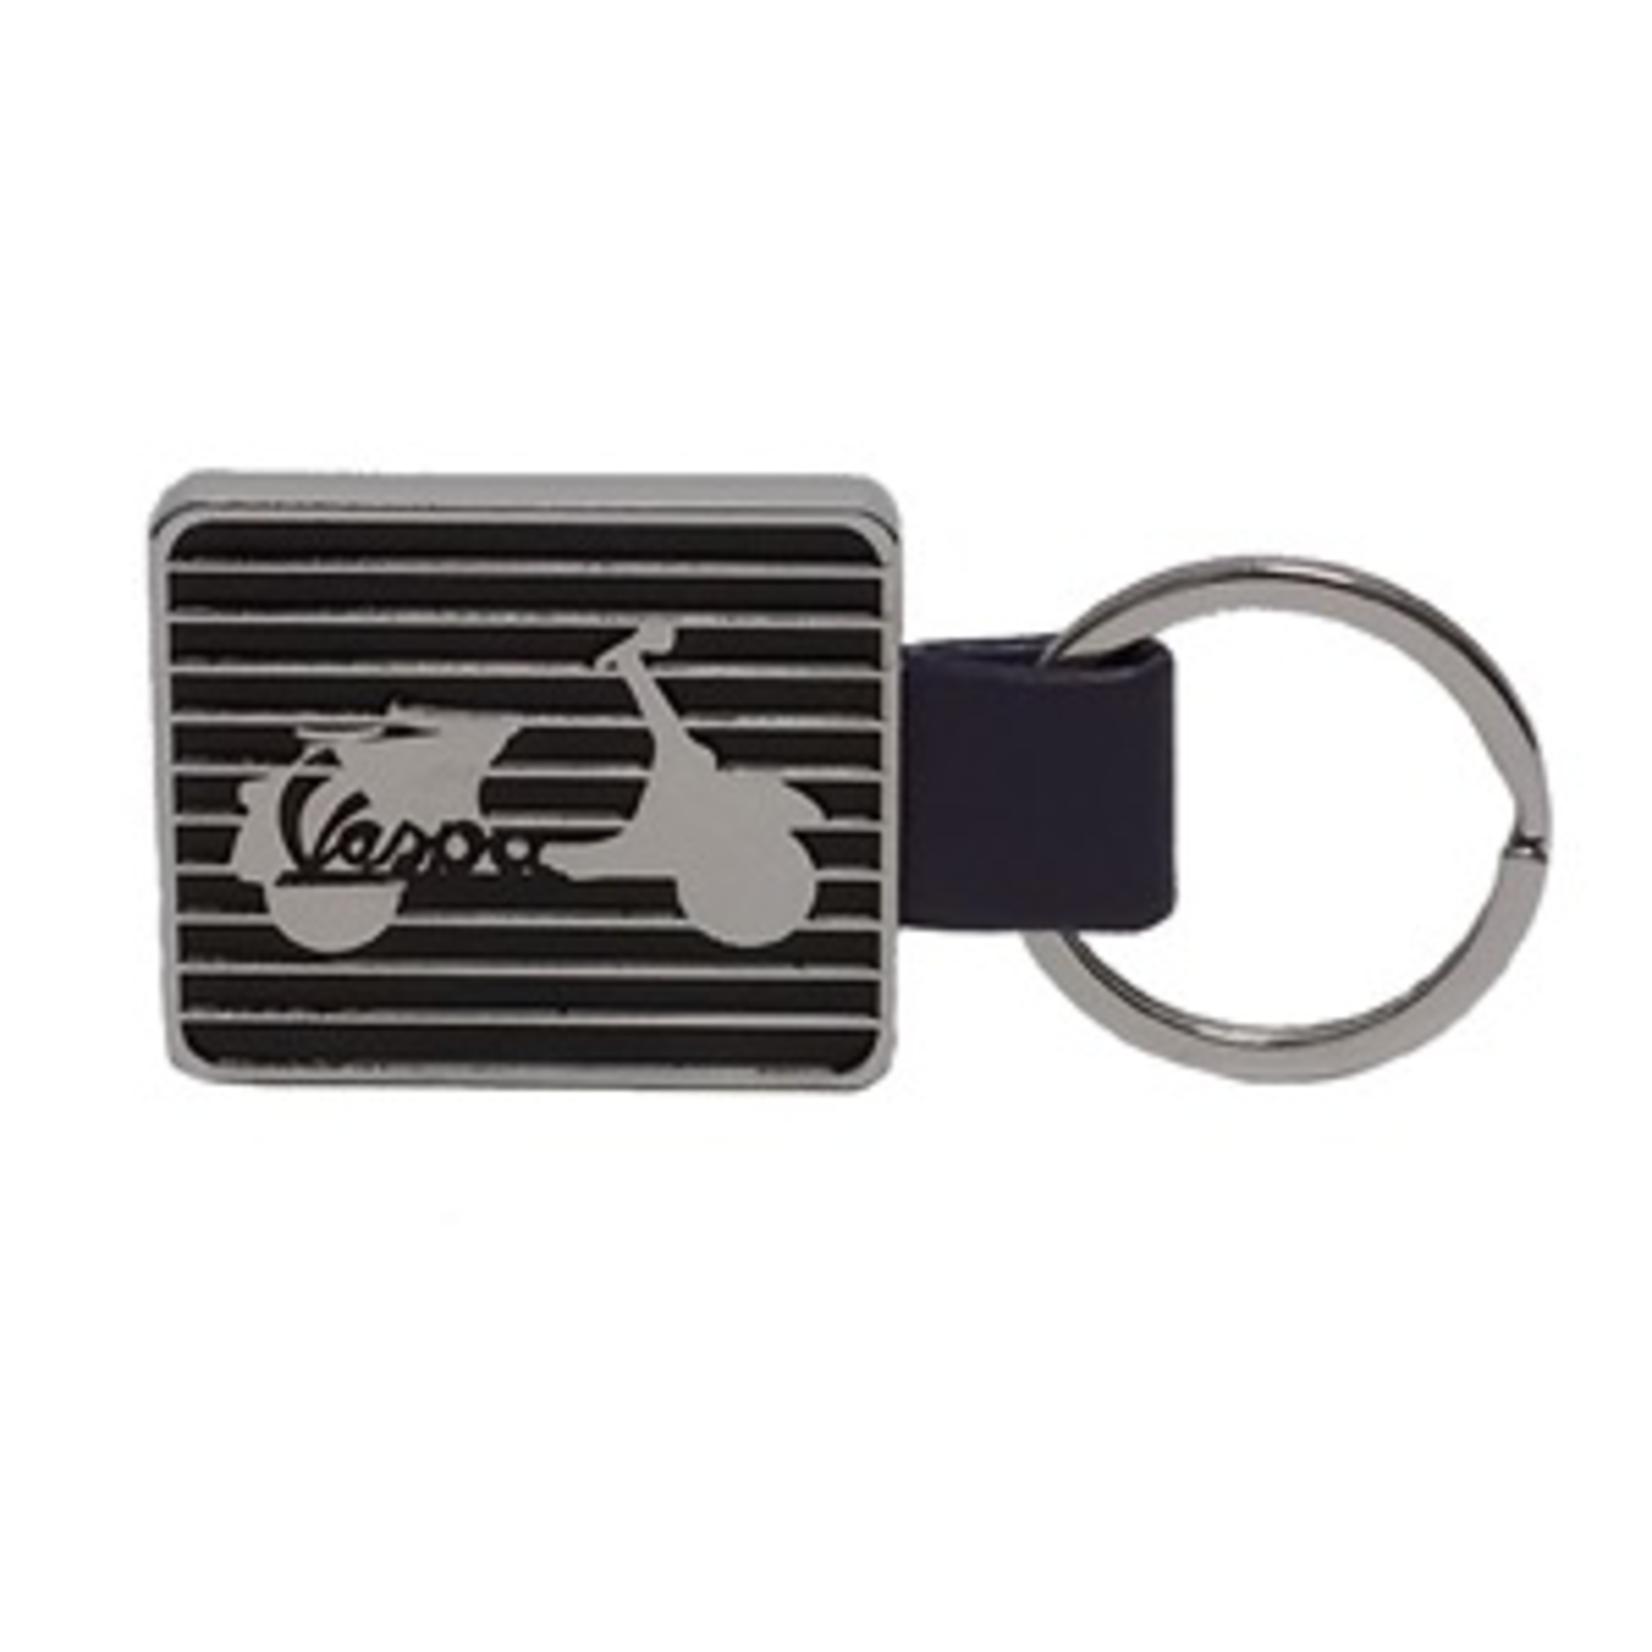 Lifestyle Keychain, Vespa Black Gift Case